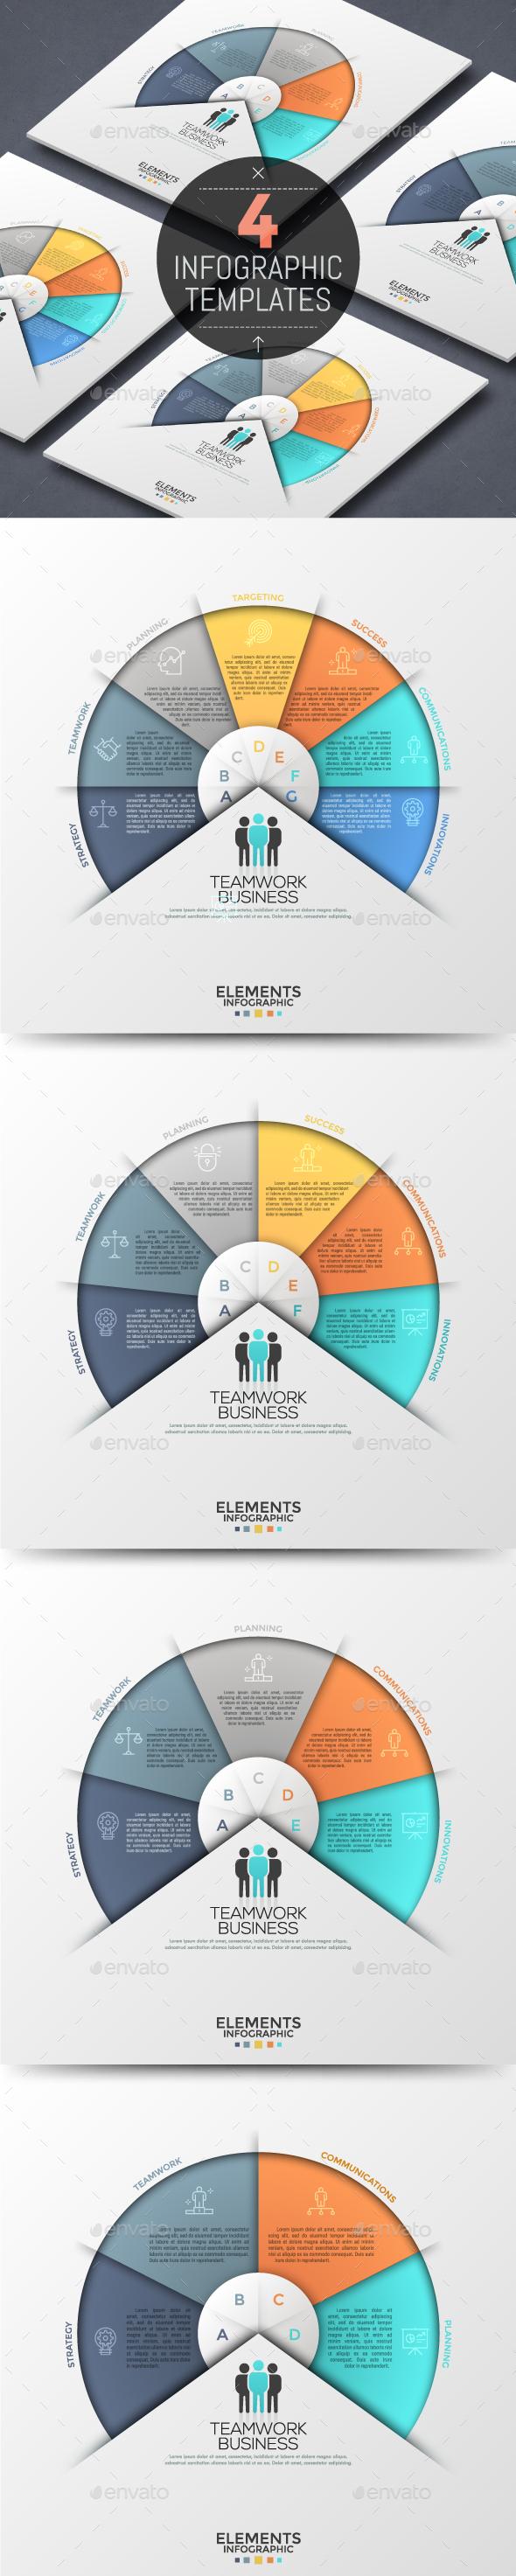 Modern Infographic Circular Template (4 Items) - Infographics